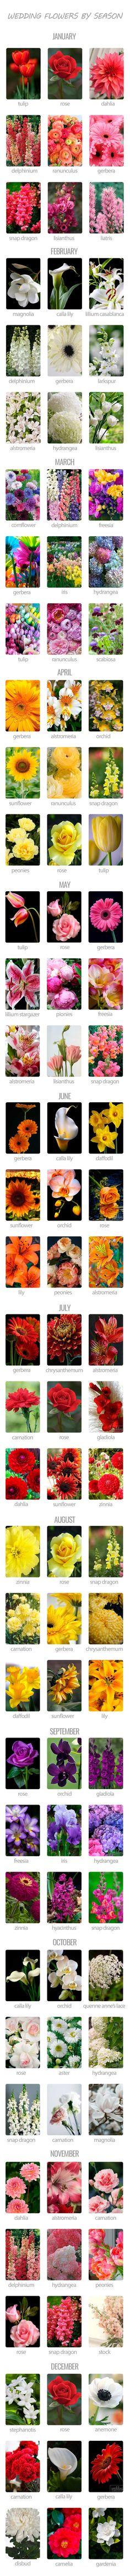 Choosing Wedding Flowers By Season ❤ Want to save money on your wedding? Choose in season flowers! See more: http://www.weddingforward.com/choosing-wedding-flowers-season/ #weddings #bouquets                                                                                                                                                                                 More